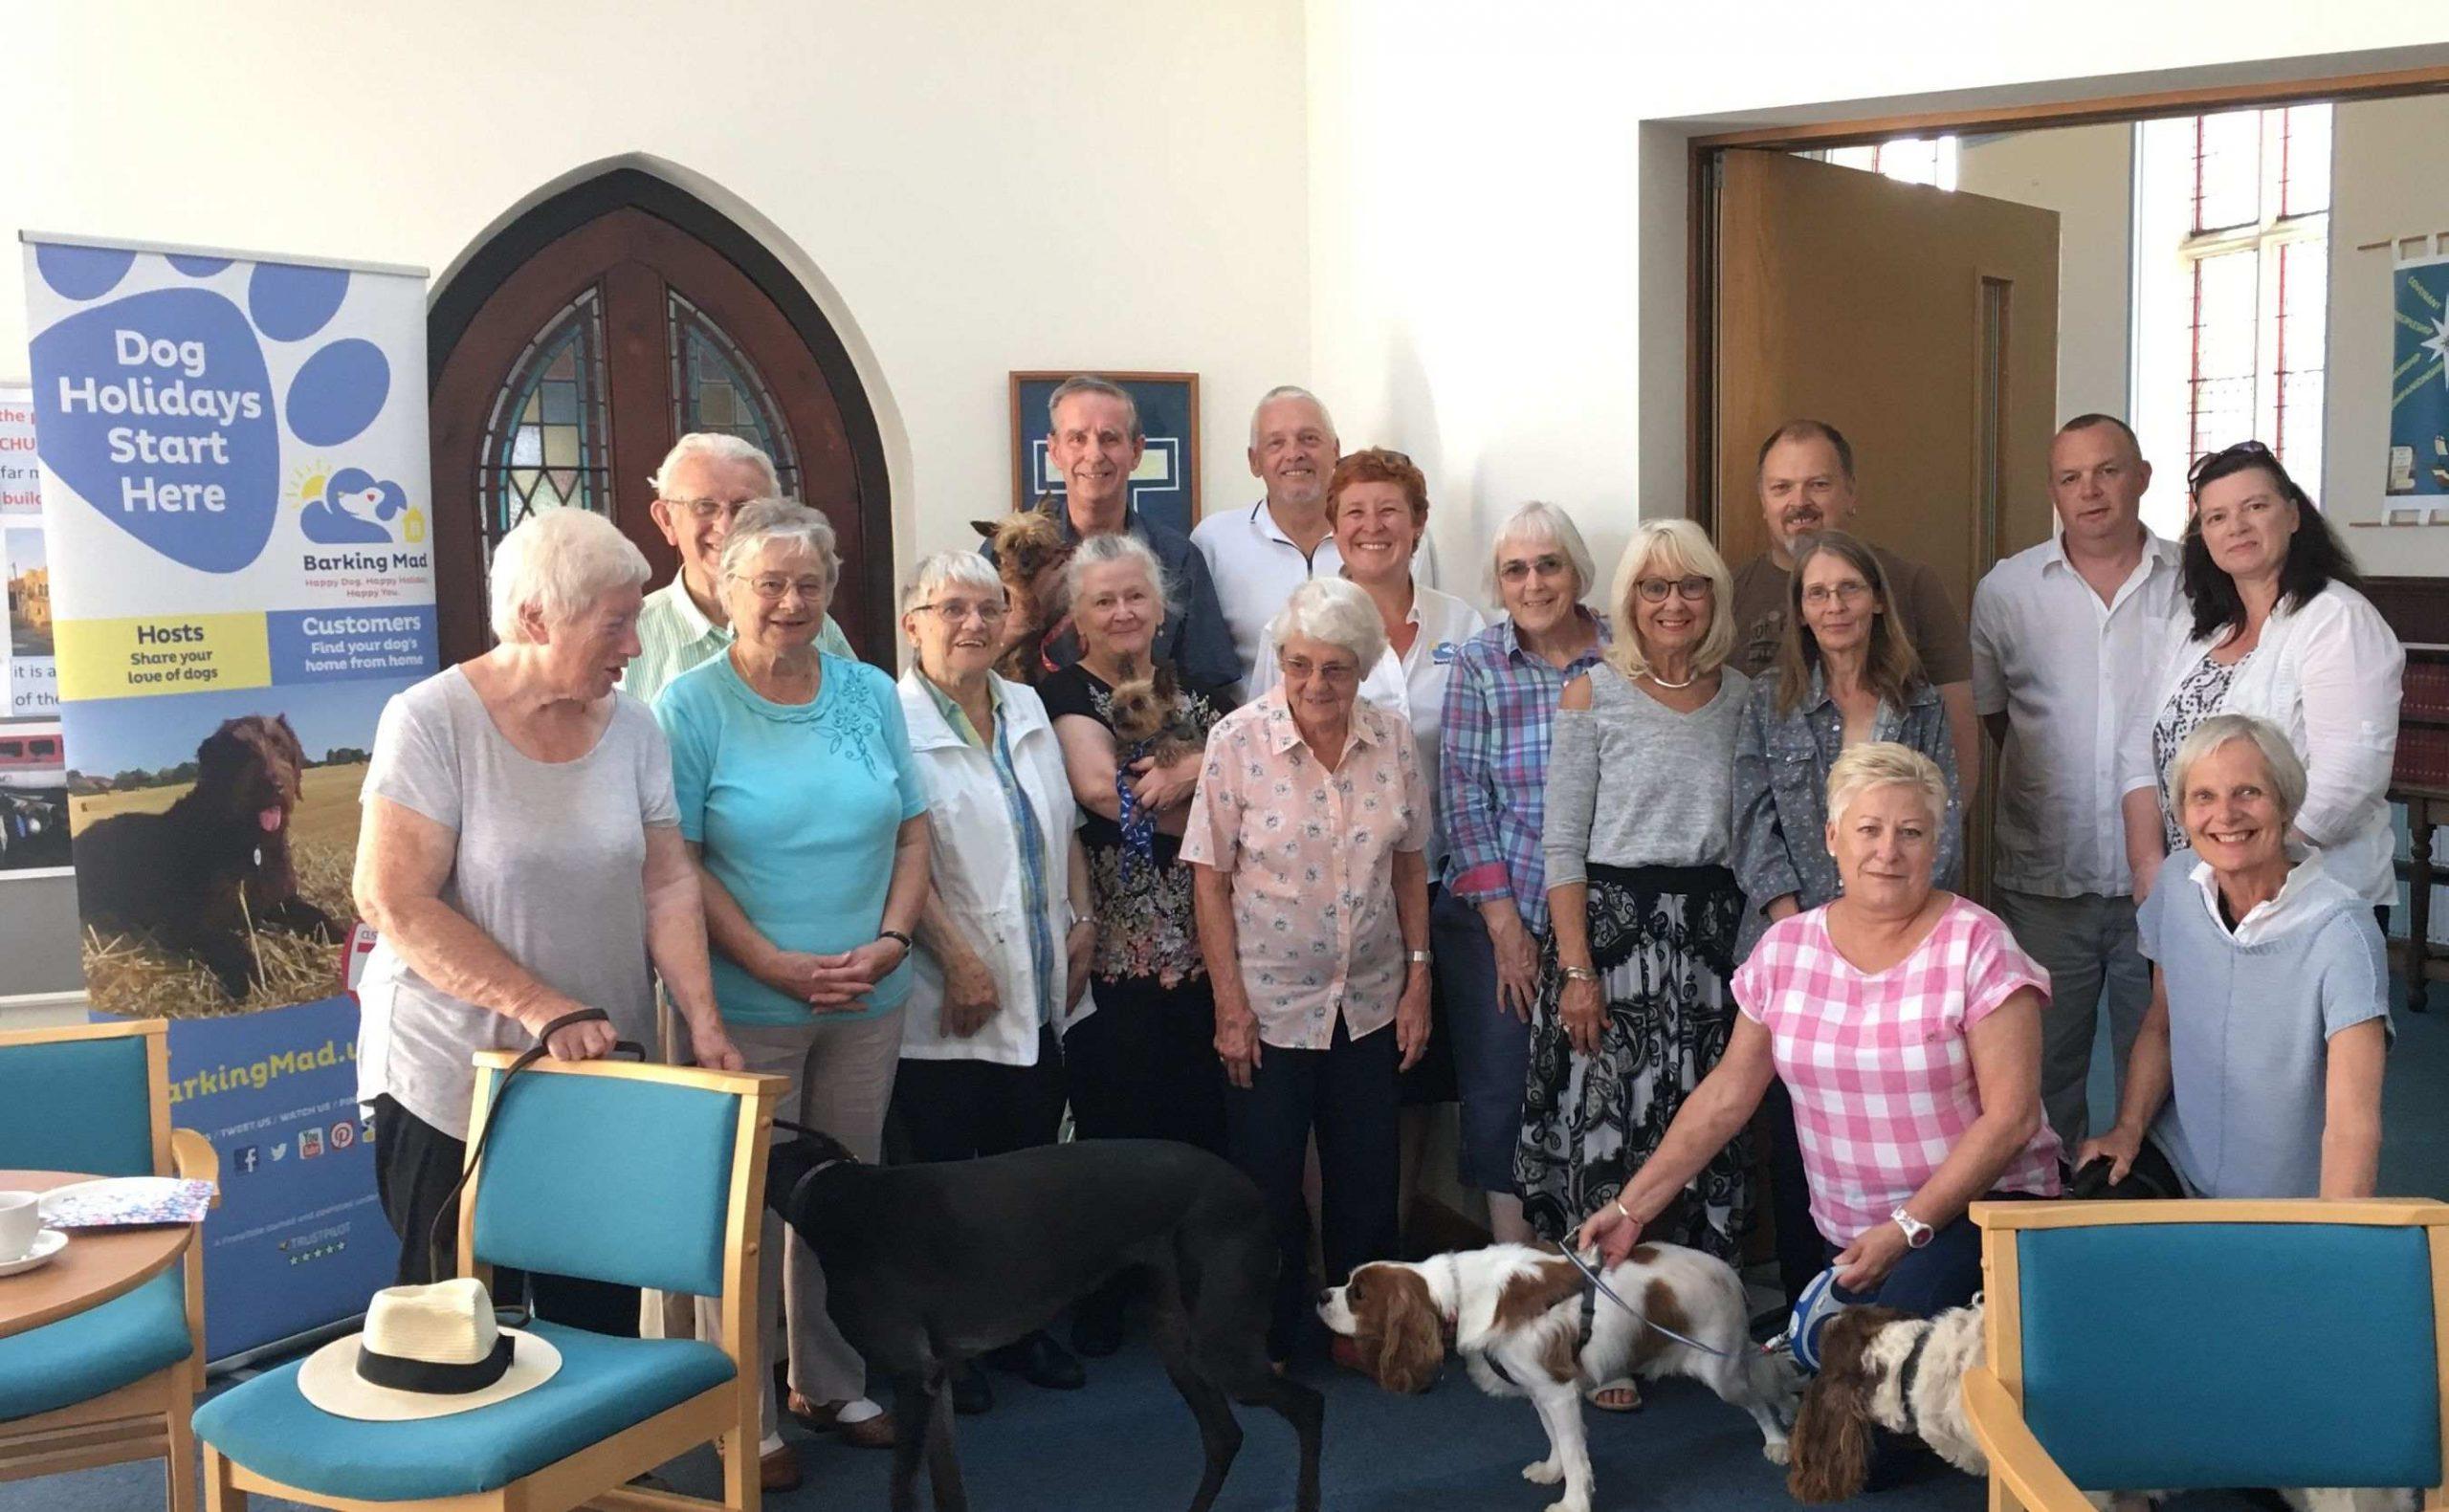 Barking Mad Host Community Dog Sitting Home Boarding Group Inside